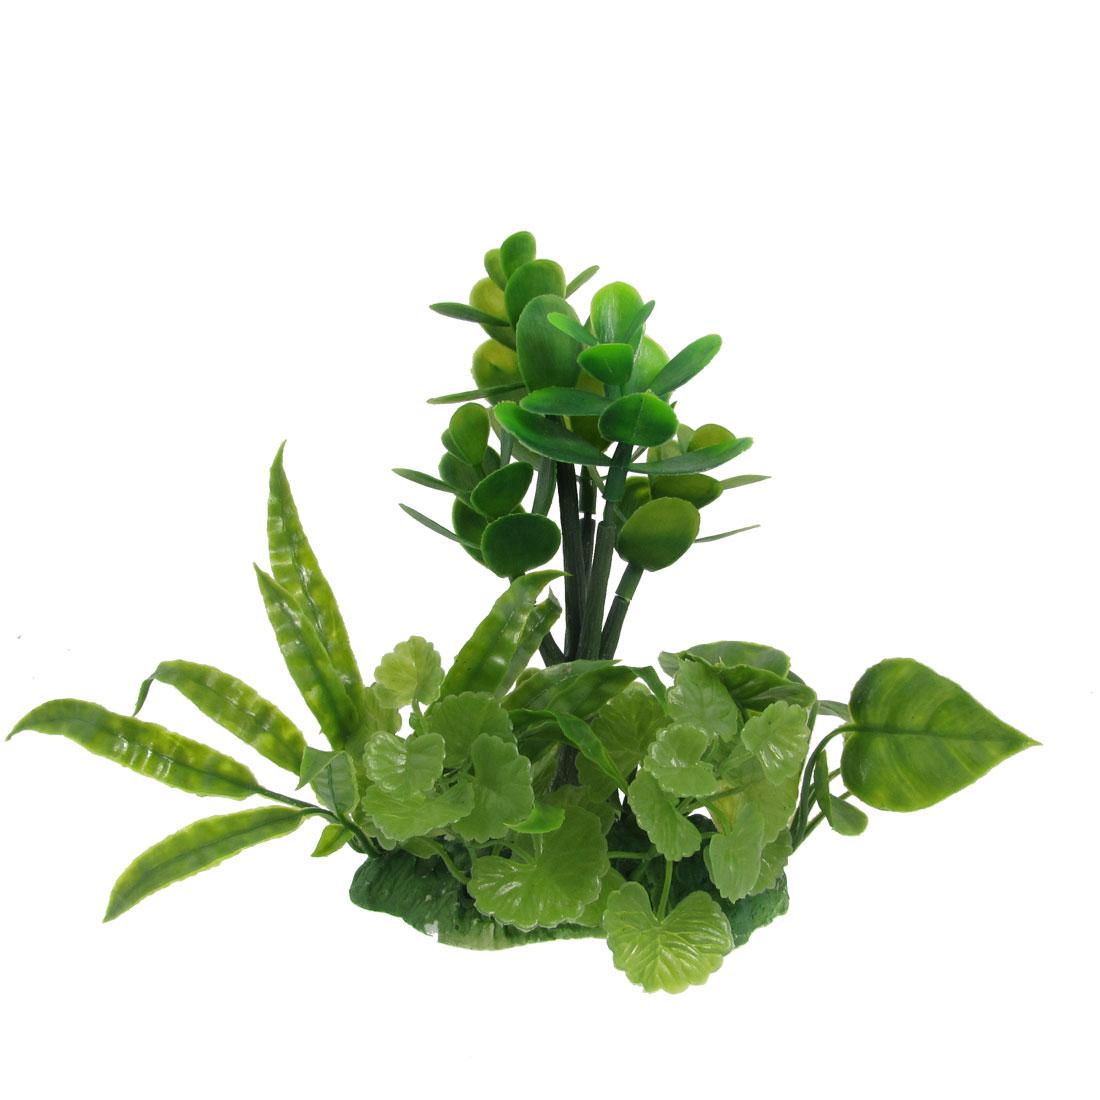 "Aquarium Emulational Green Plastic Plant Ornament 7.3"" w Ceramic Base"